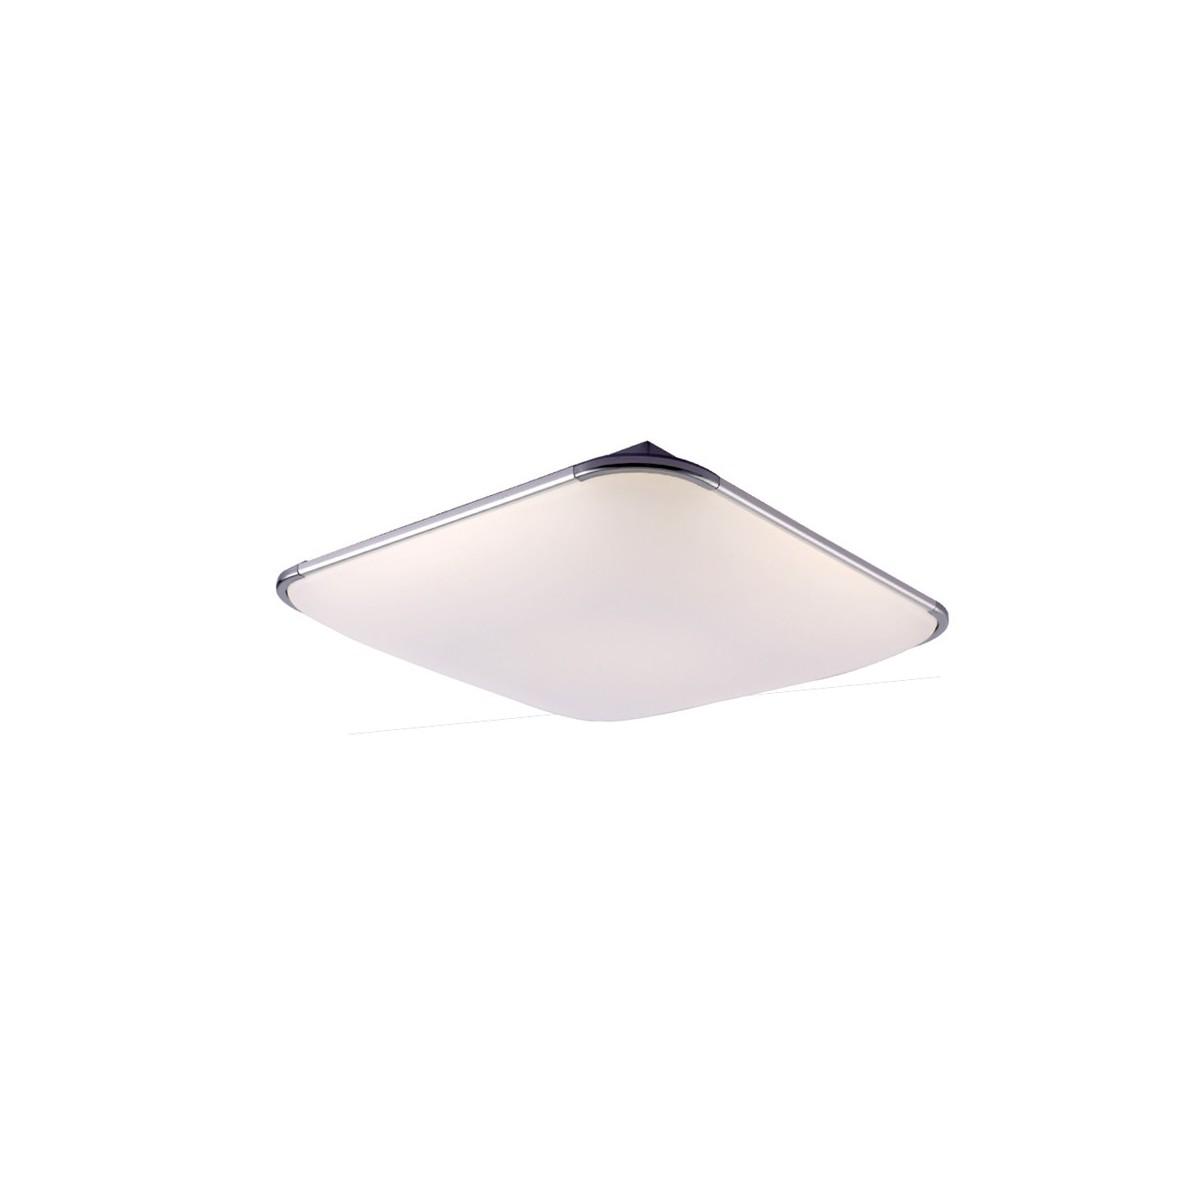 Plafón LED 12W CRETA